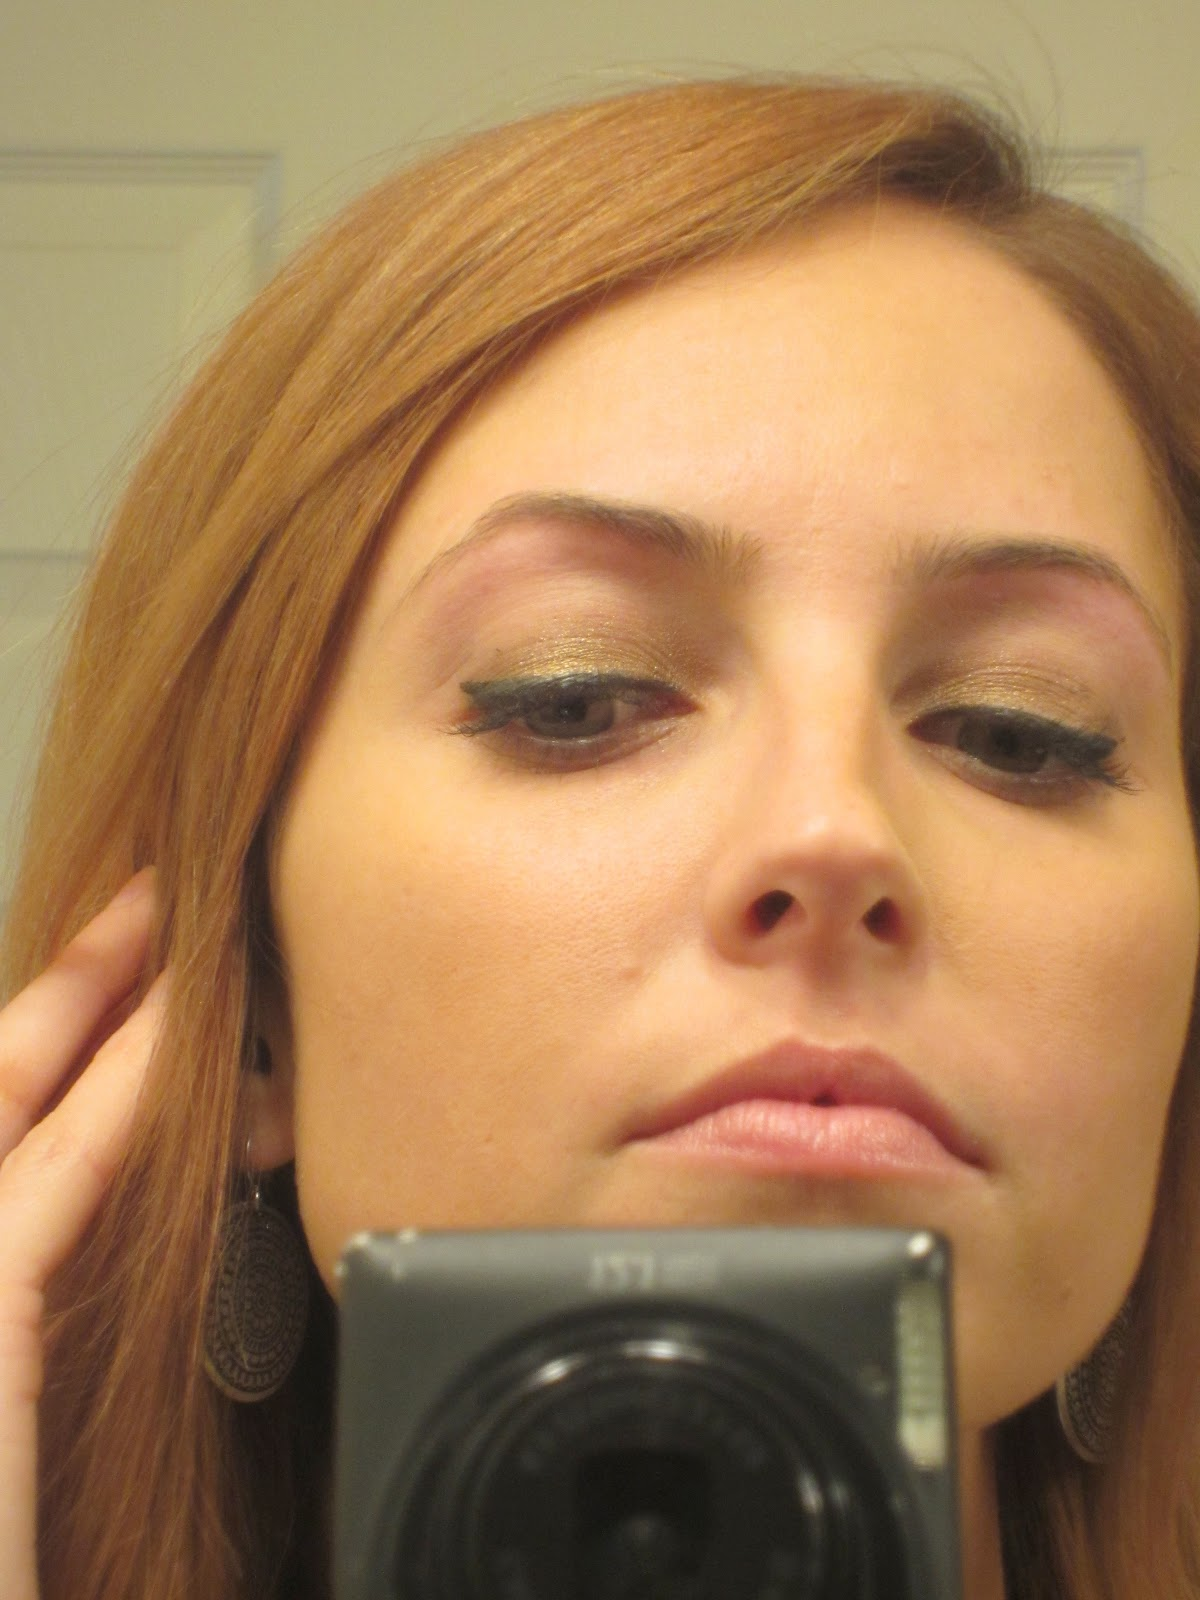 http://4.bp.blogspot.com/-w0L6A7JqKHI/TubyYSM-cmI/AAAAAAAACR8/LVbcz75iC94/s1600/Eyebrow%2BThreading%2BCloseup.jpg